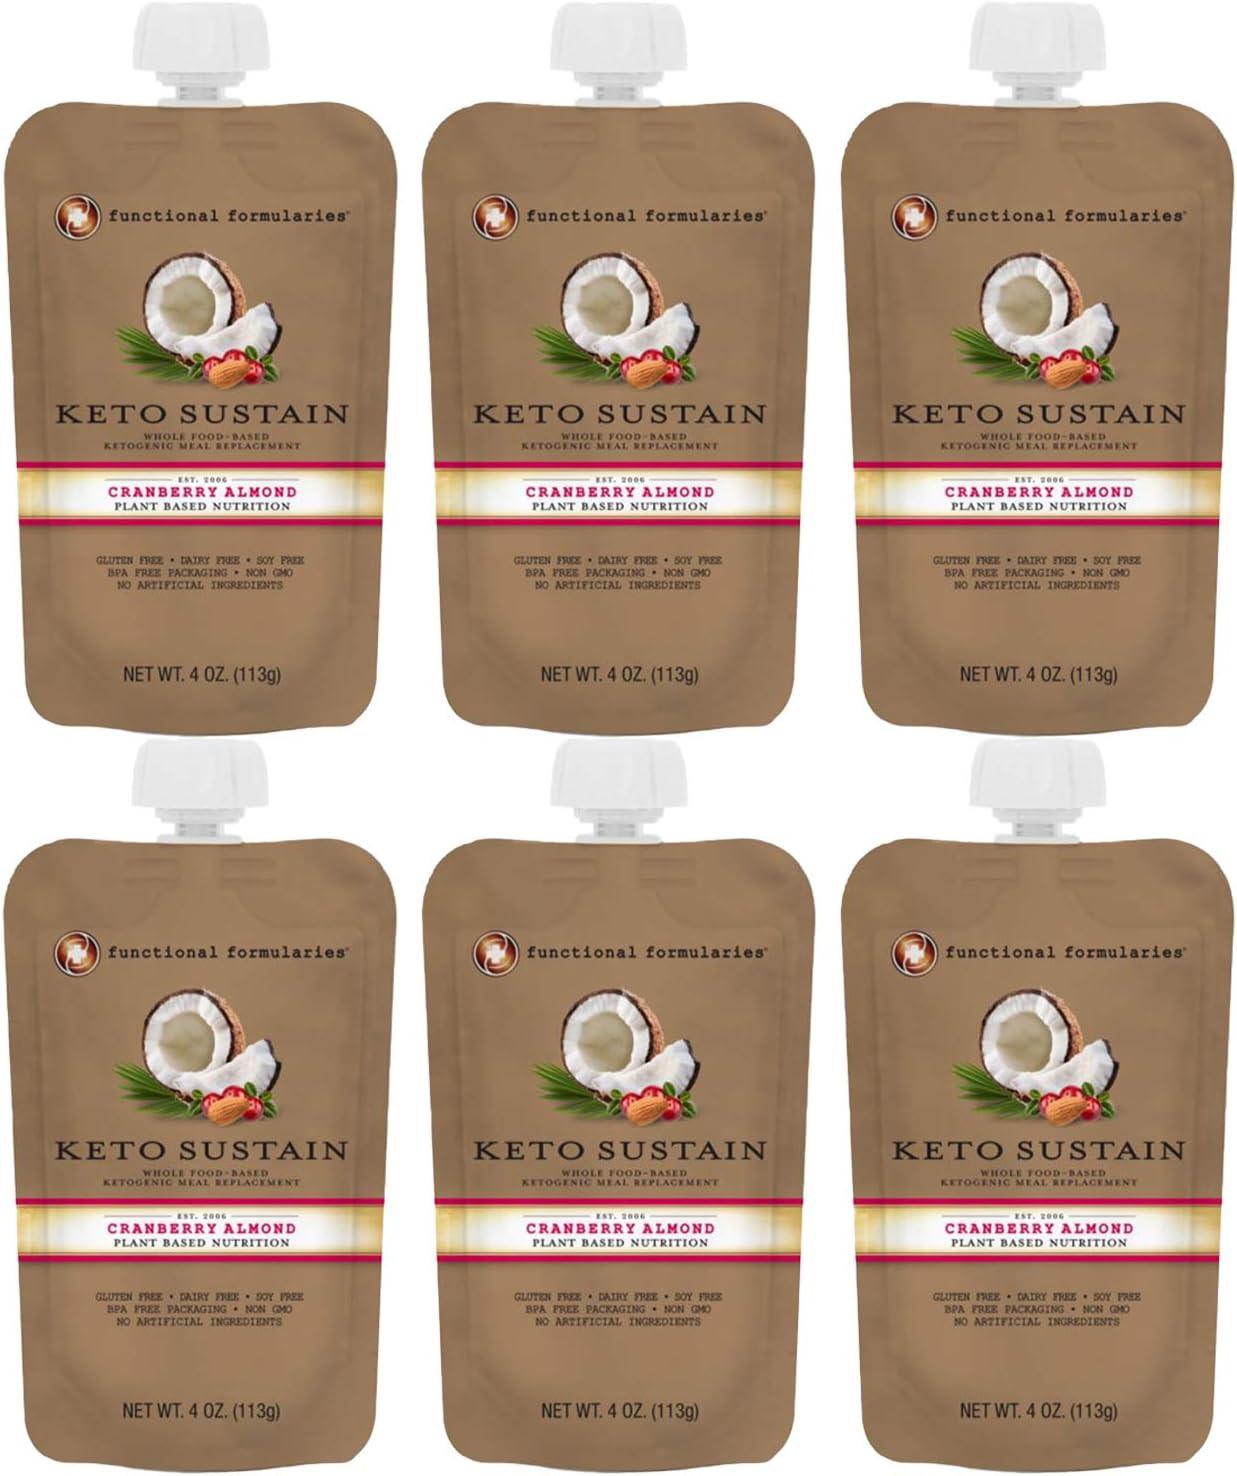 Functional Formularies New sales Keto Sustain Ketogenic Almond Under blast sales Cranberry